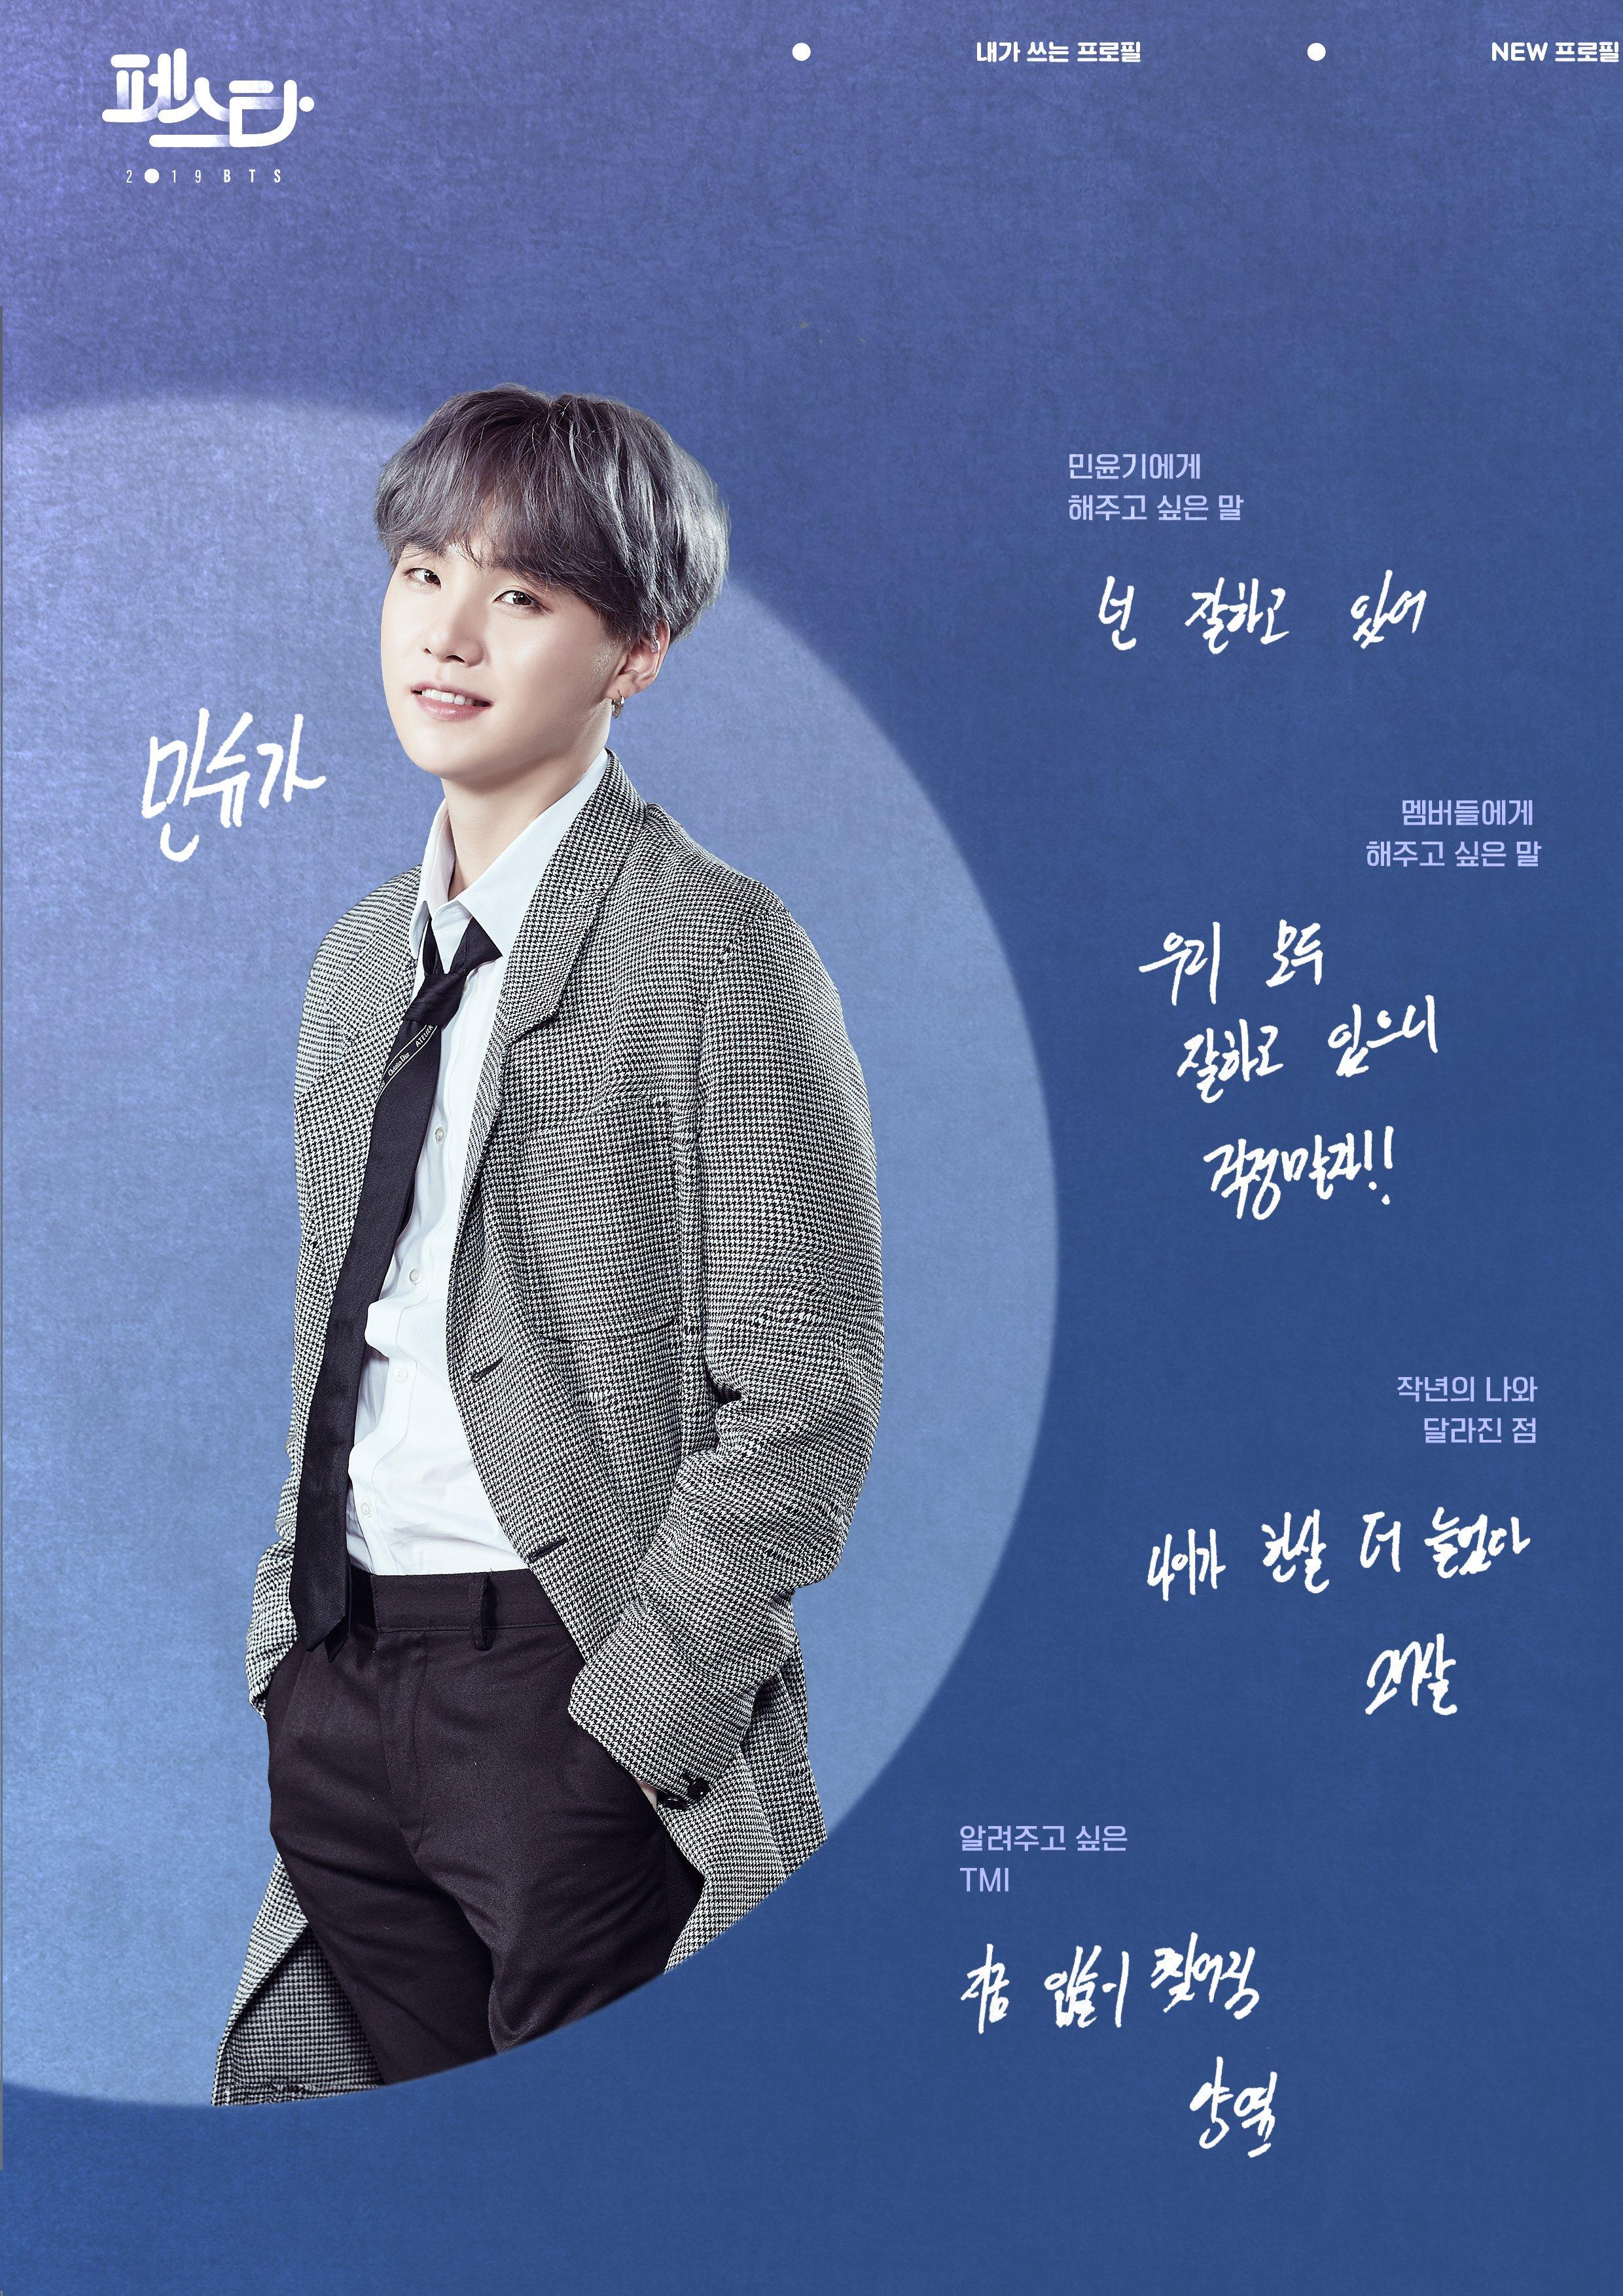 BTS SUGA Profile 2019